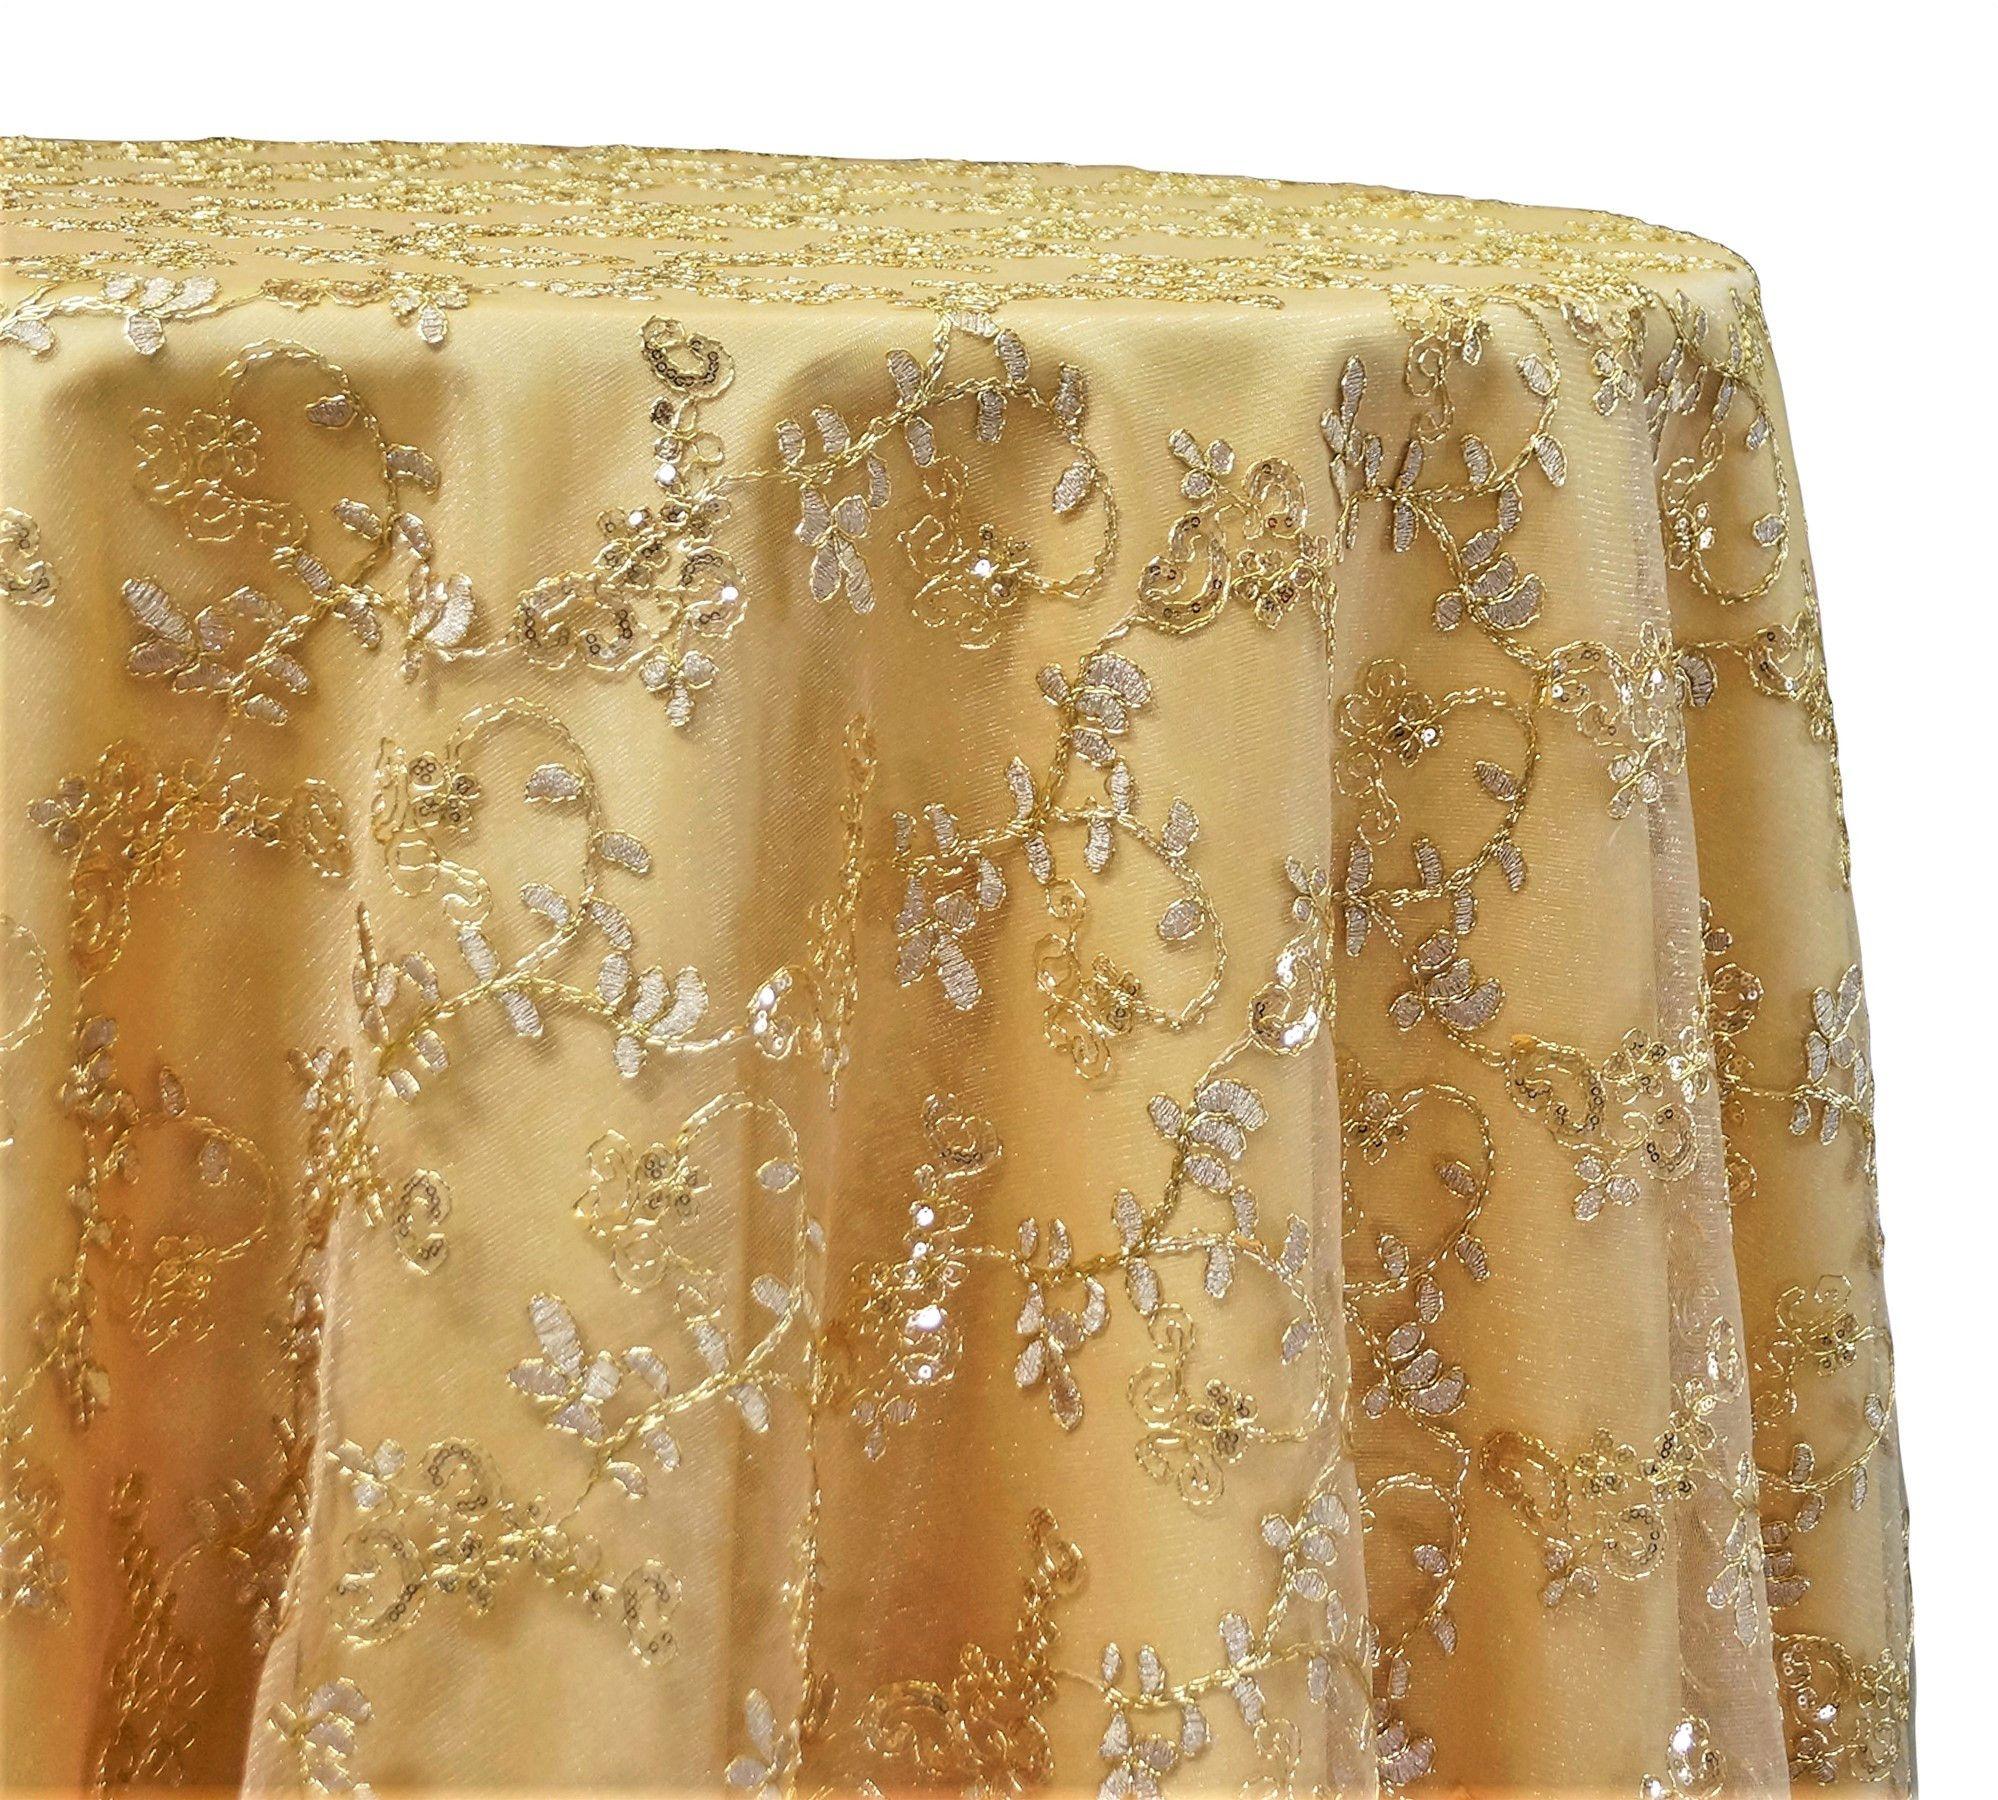 Basil Leaf Embroidery Tablecloths Overlays